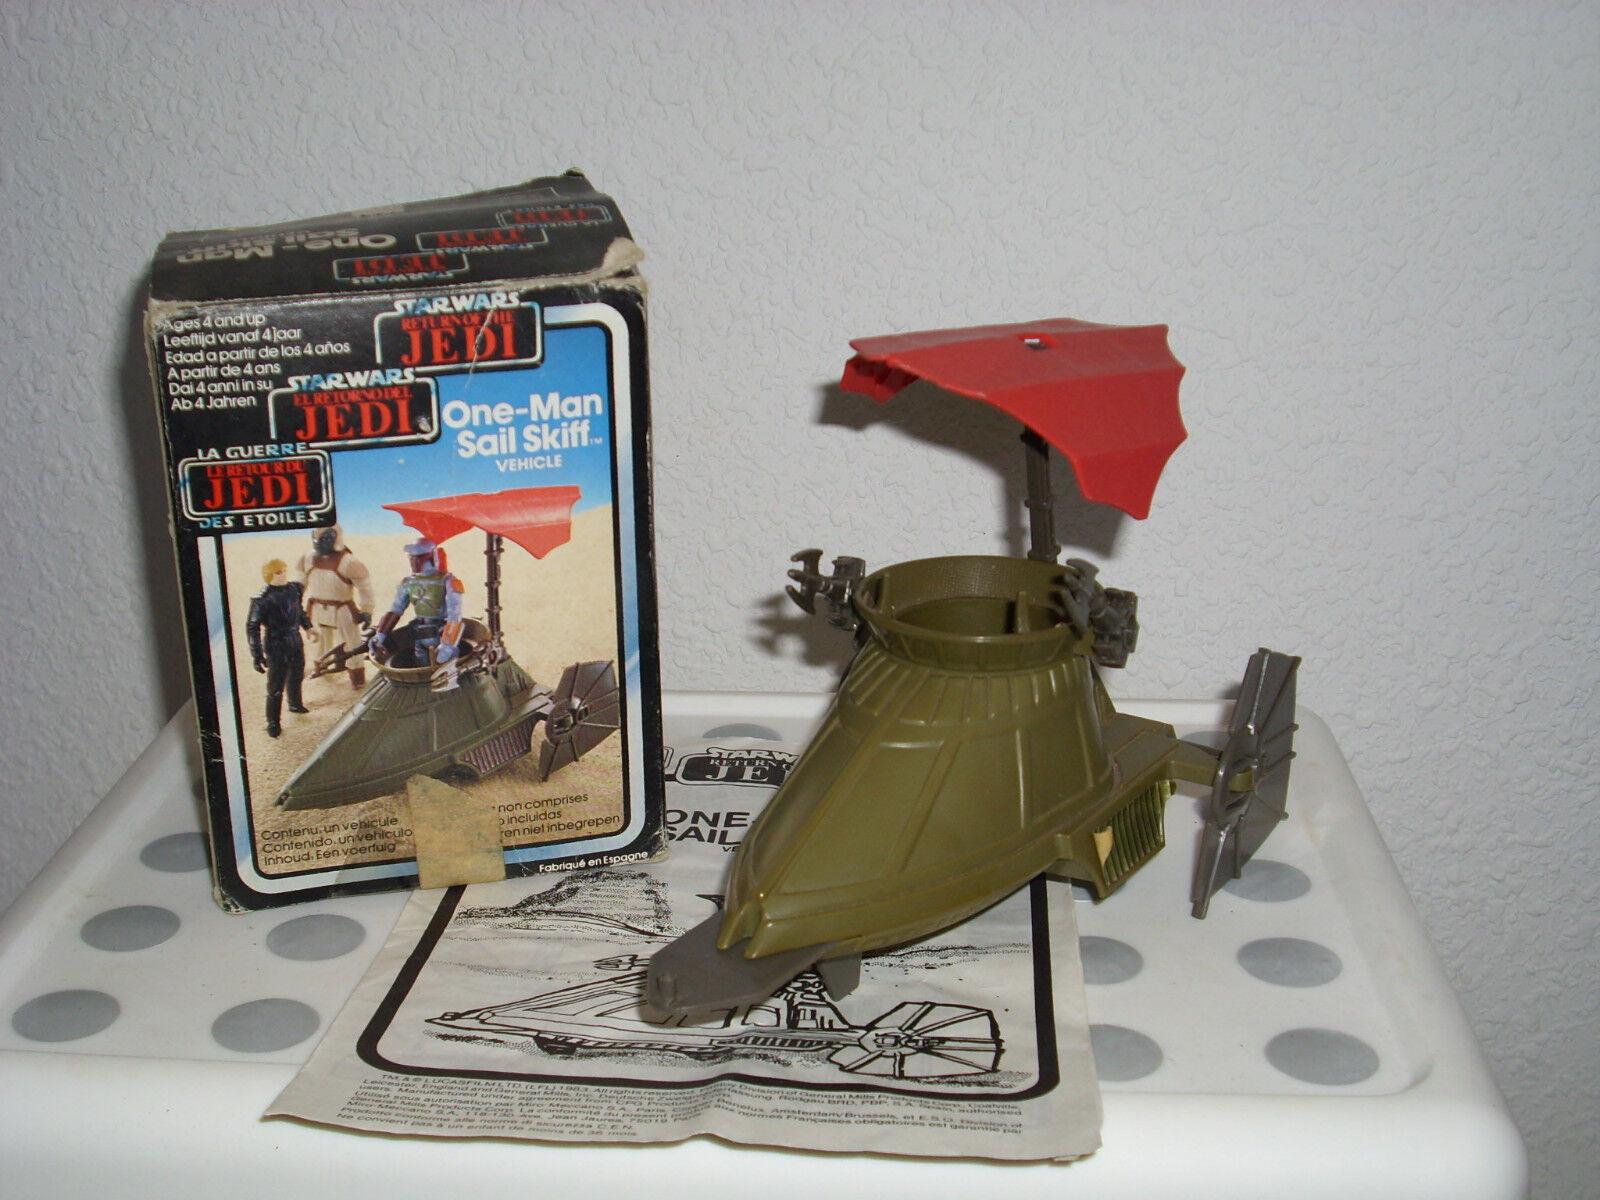 Star Wars Return of the the the Jedi - One-Man Sail Skiff   Lucasfilm 1983 b2a019